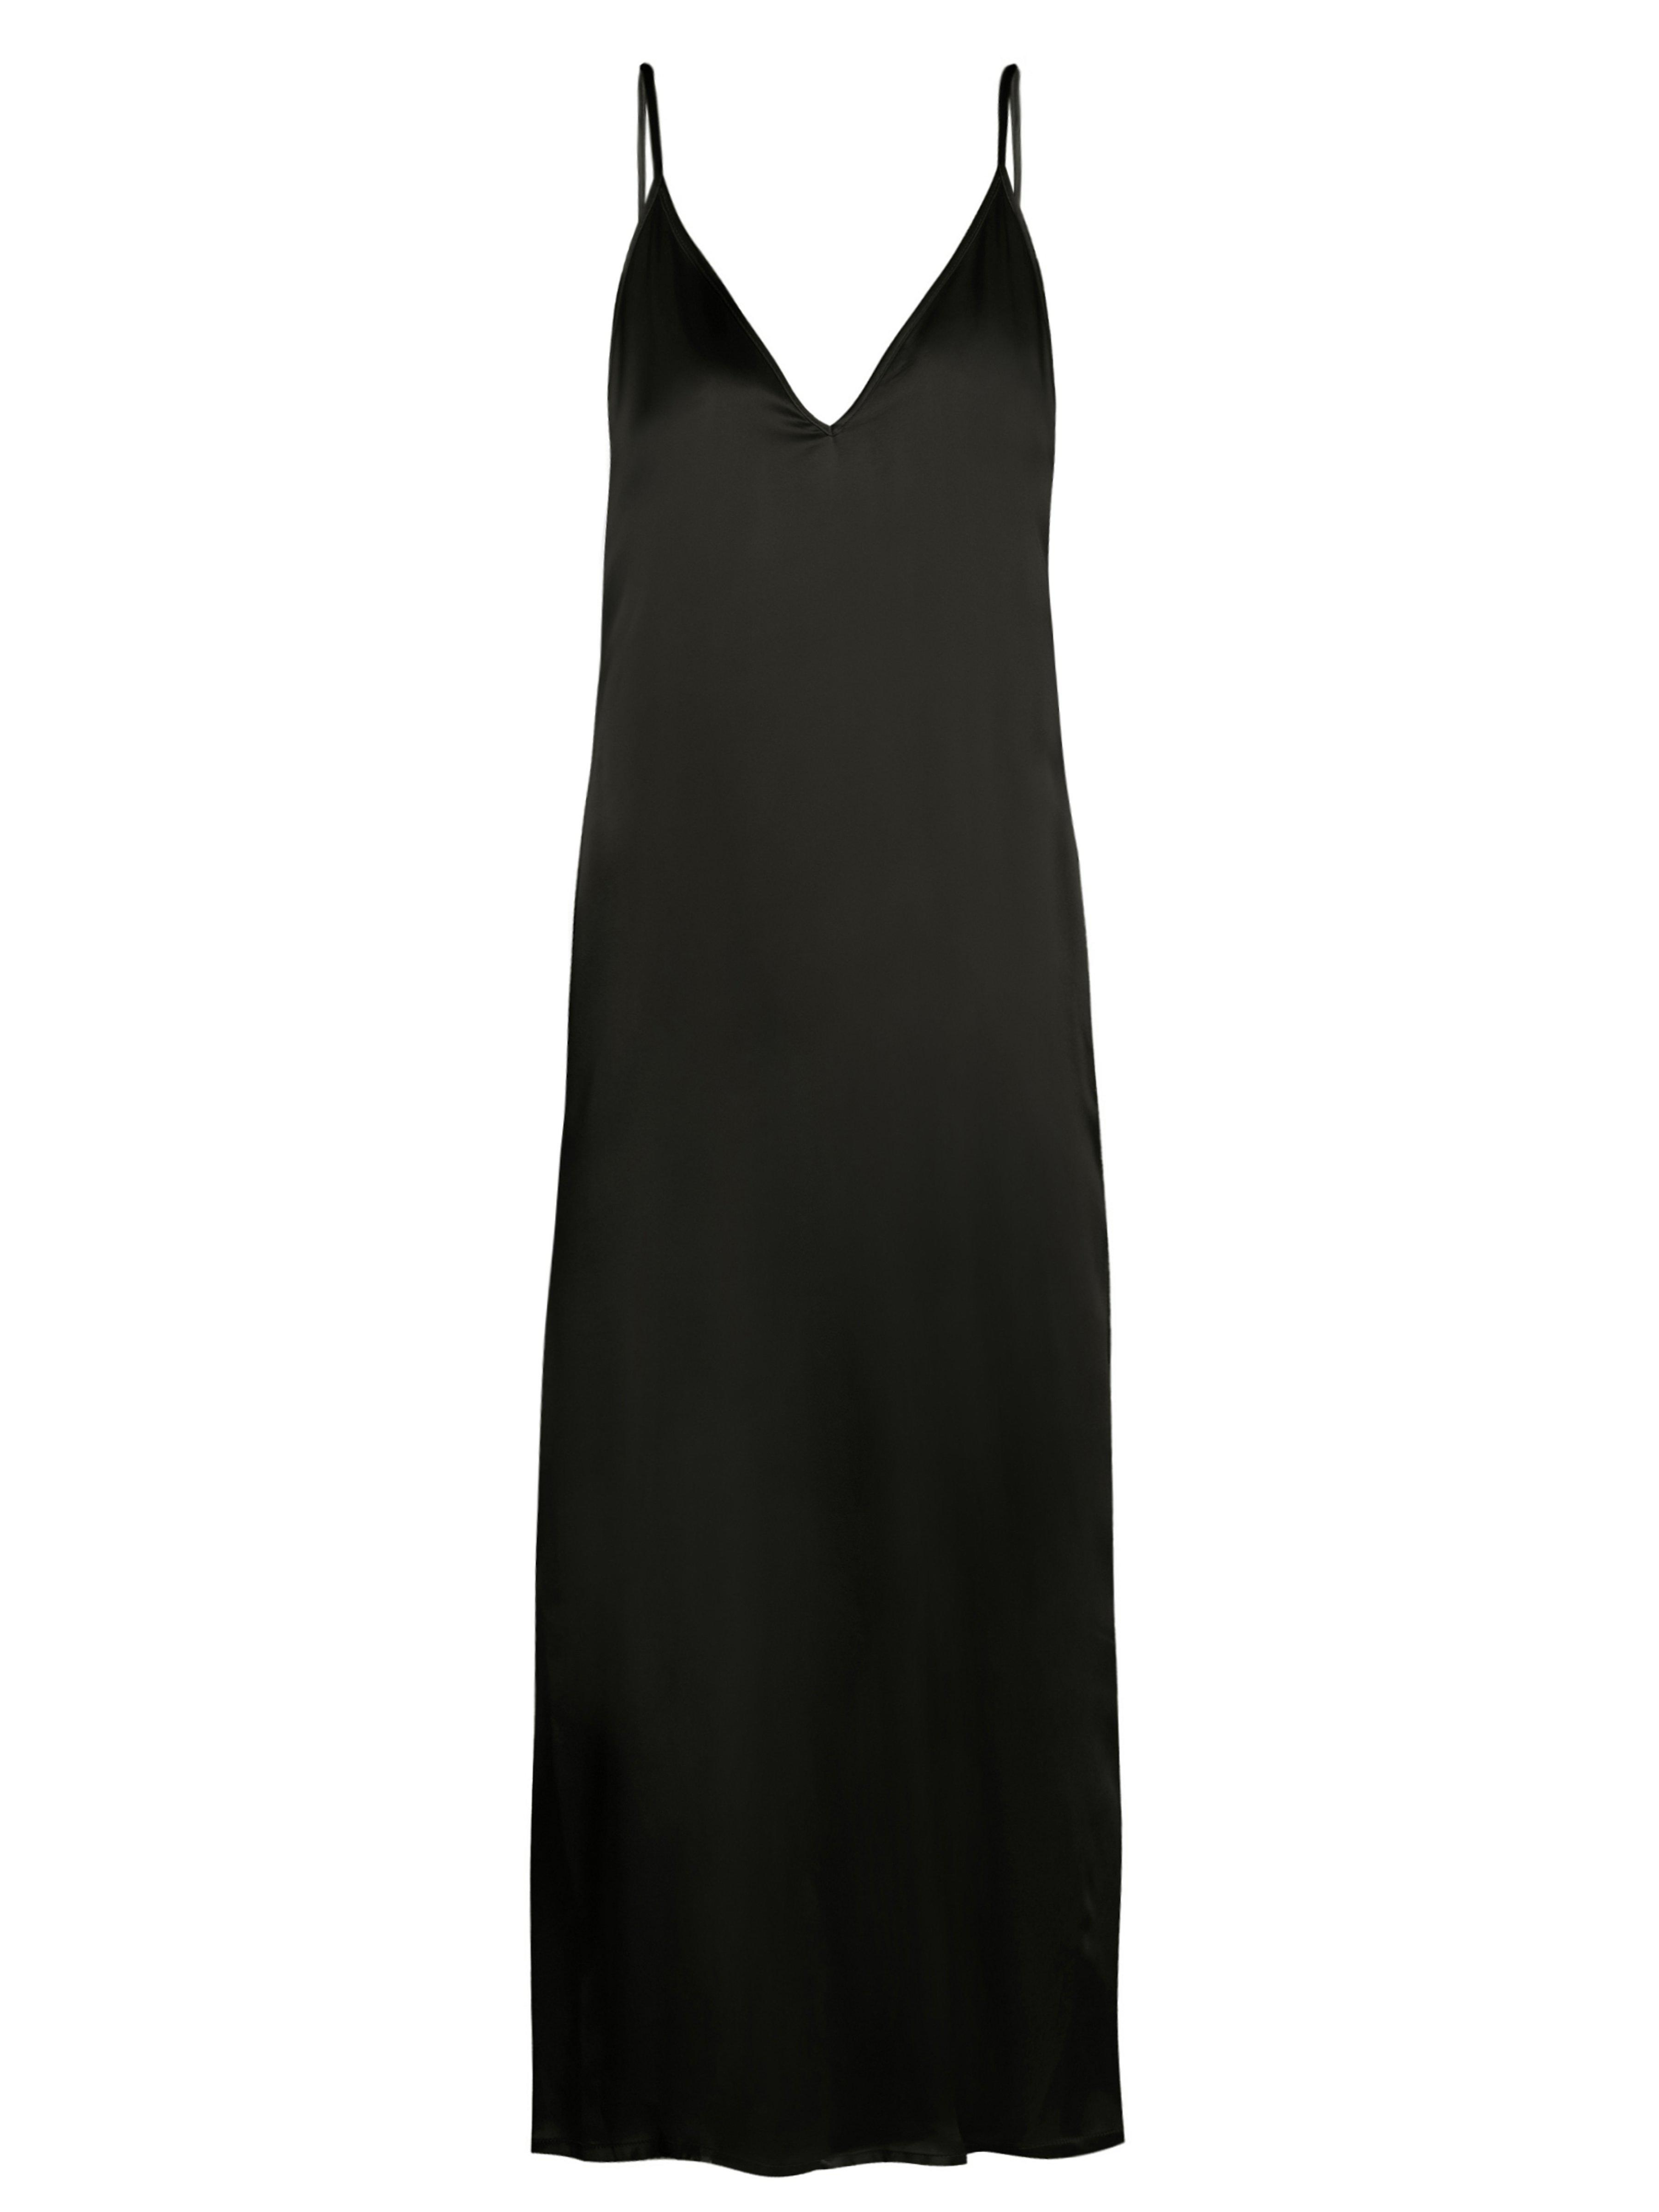 98db4db28497 Raey V Neck Silk Satin Midi Slip Dress in Black - Lyst